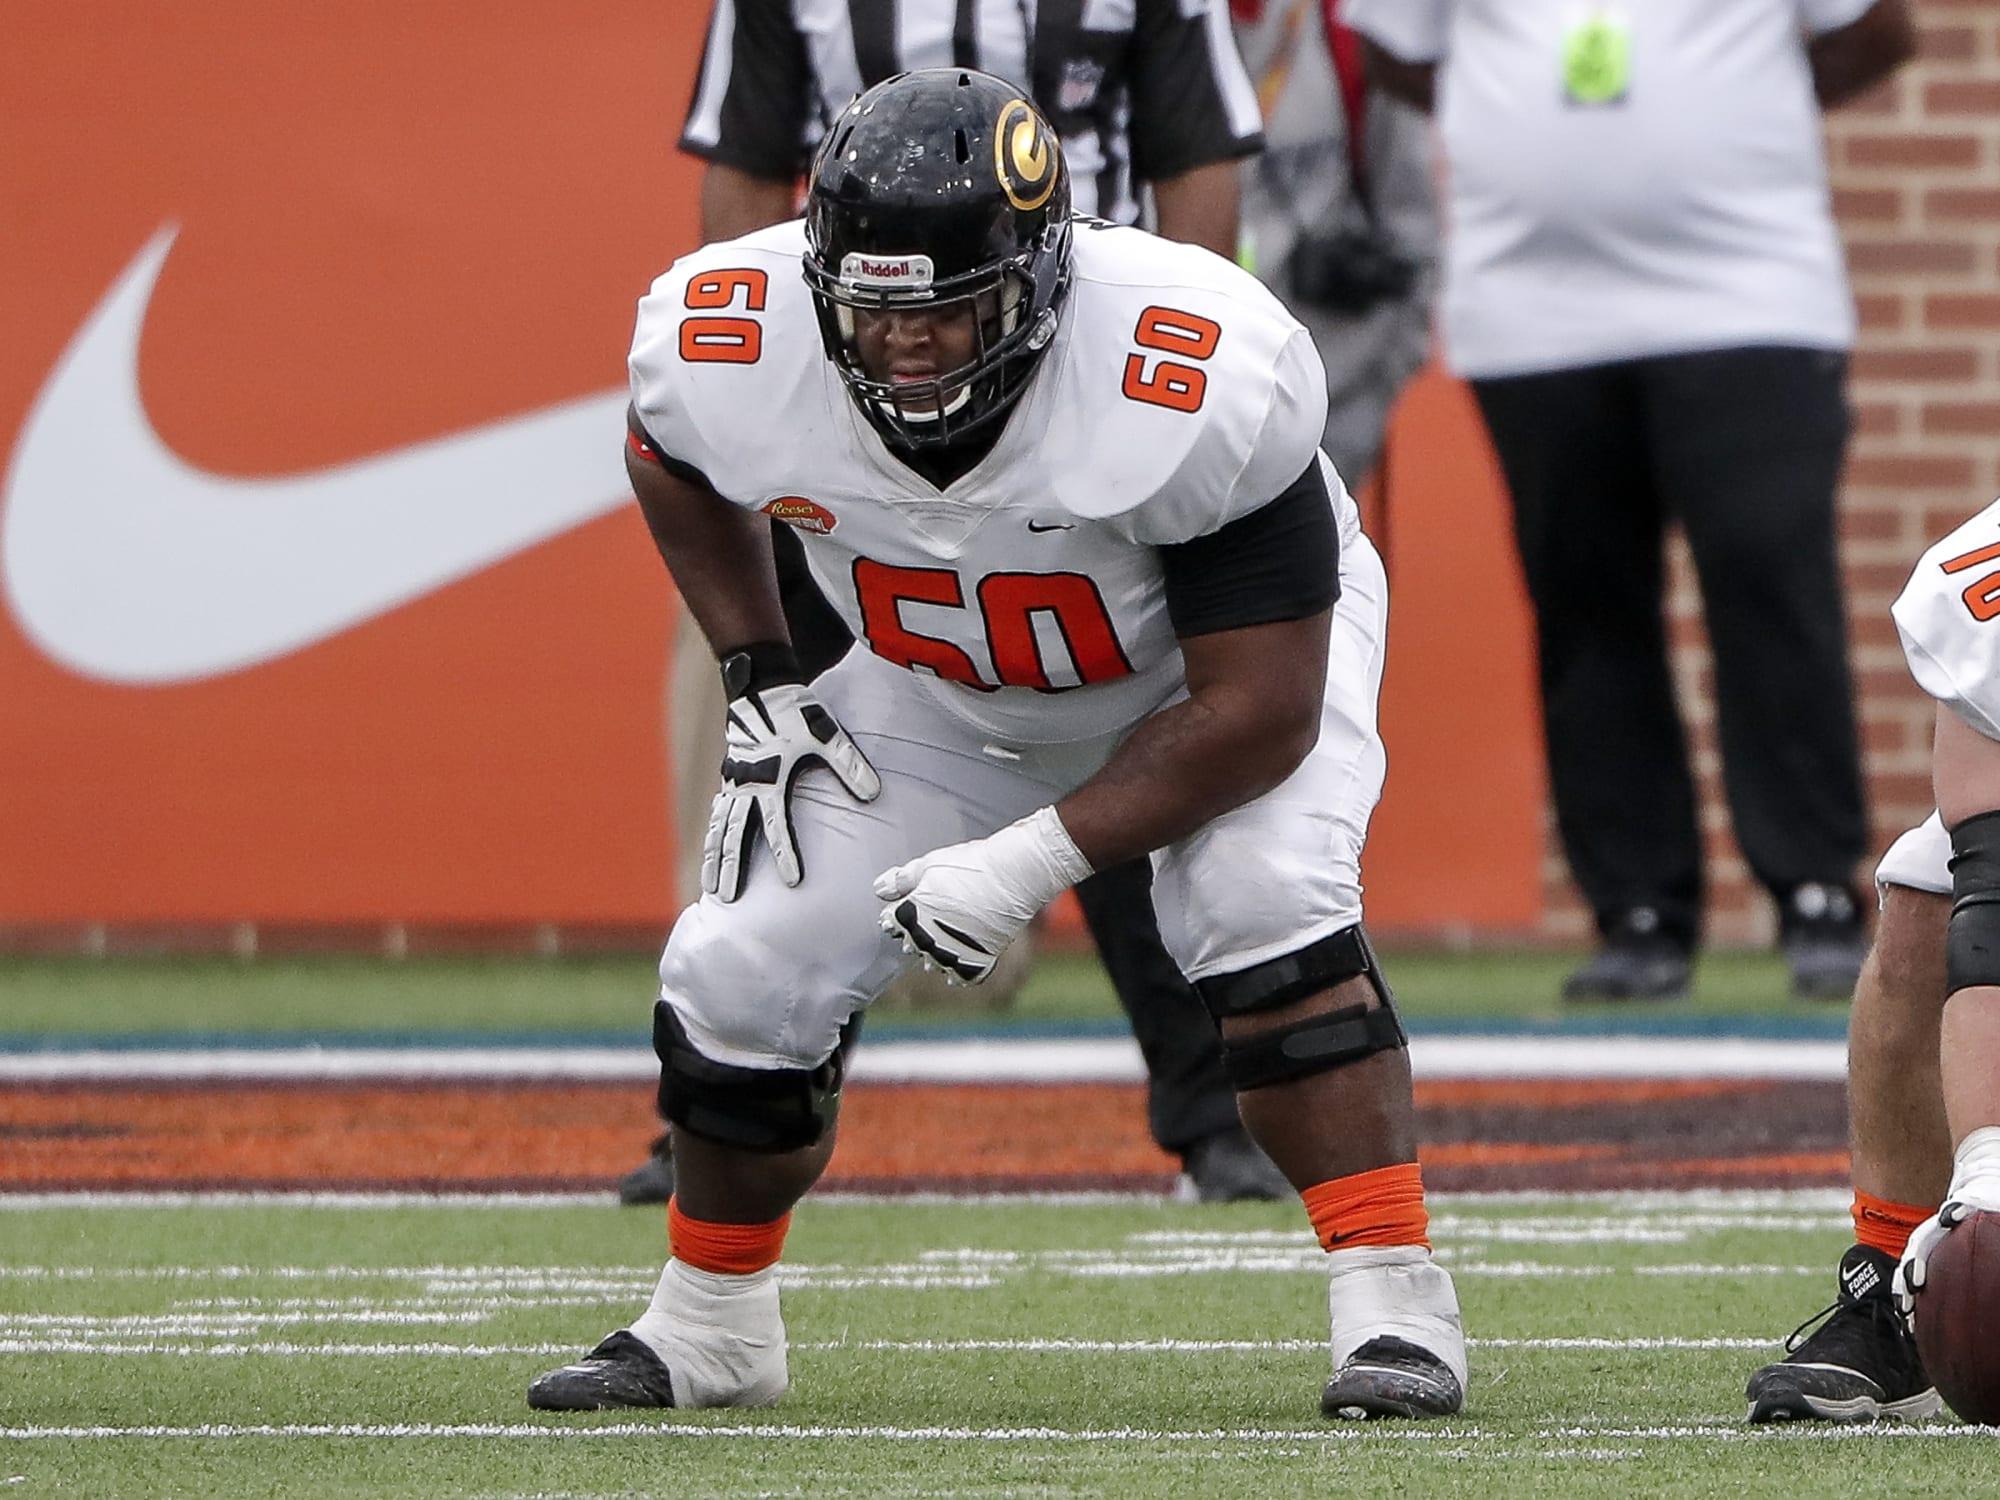 Carolina Panthers added to great 2021 Draft with UDFA David Moore